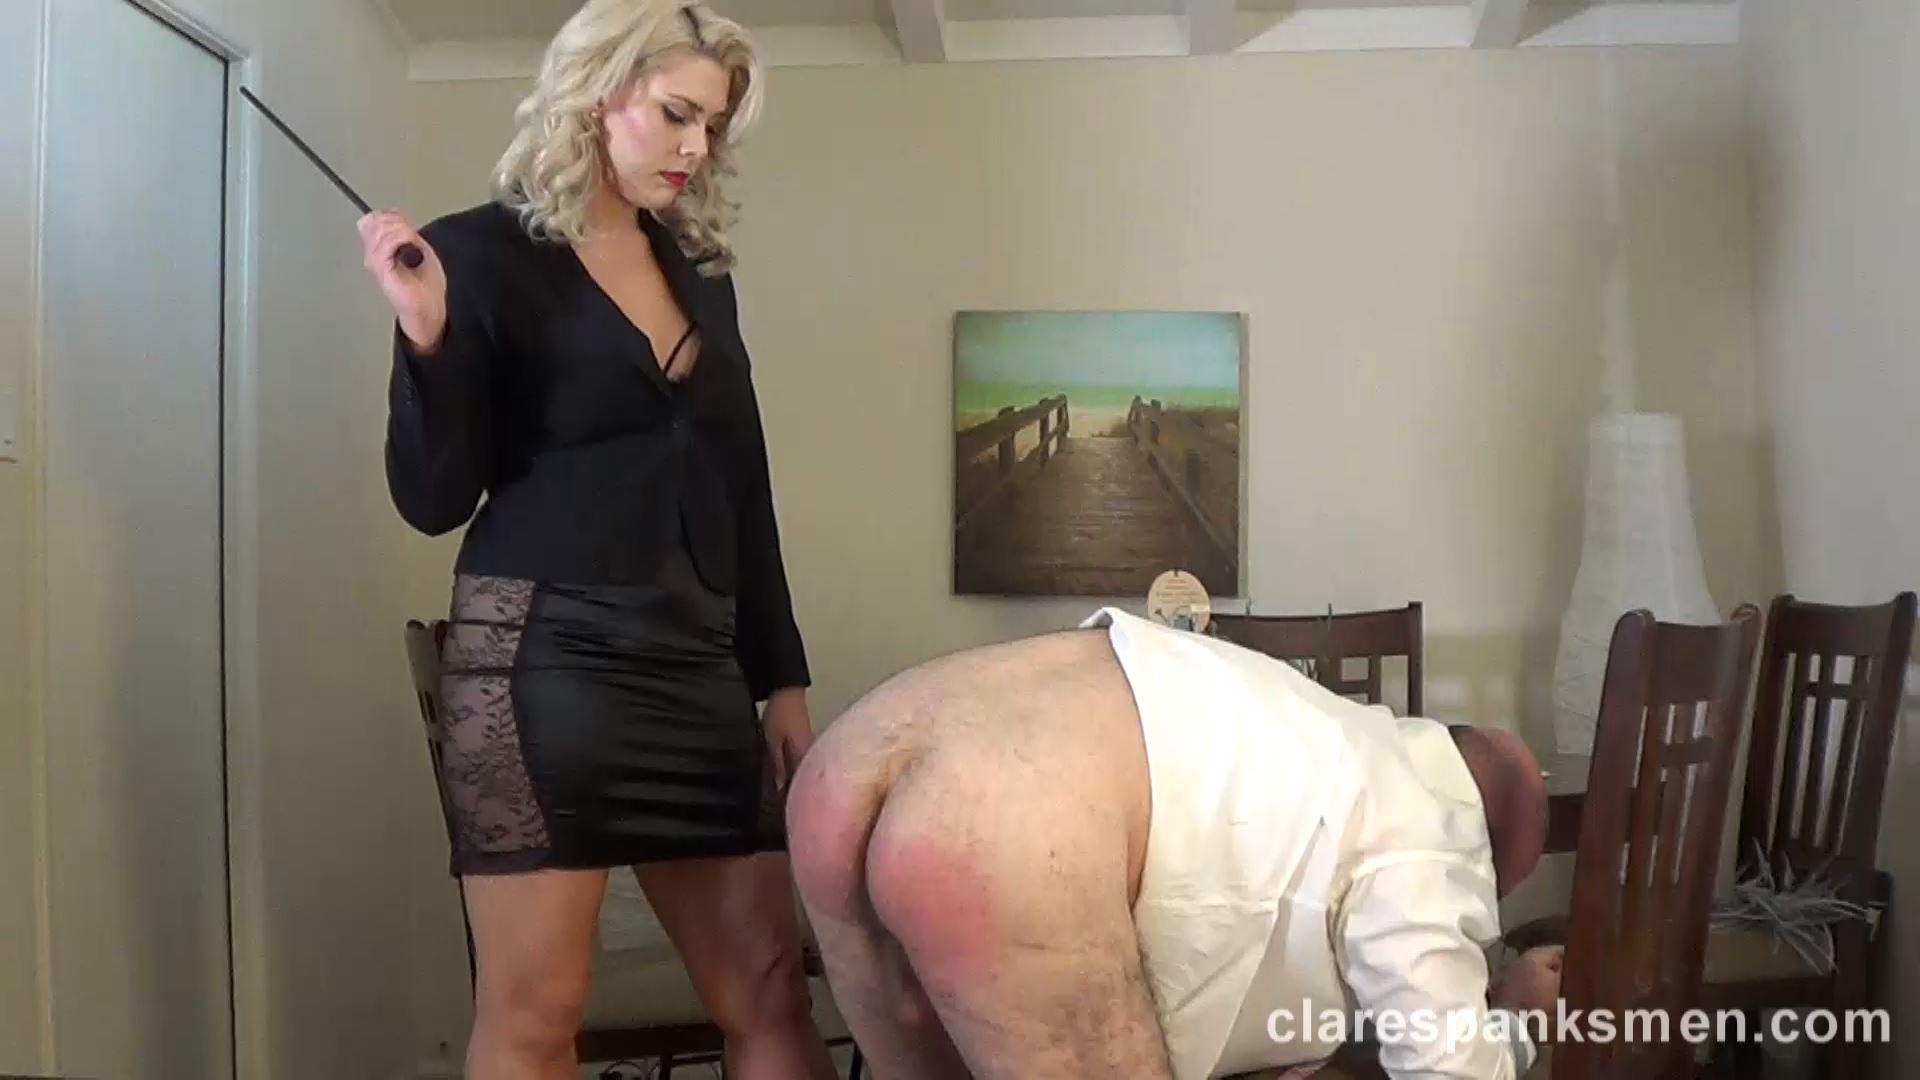 Mistress Bella Bathory In Scene: Bella Bathory Trains Men Day 2 - CLARESPANKSMEN - FULL HD/1080p/MP4